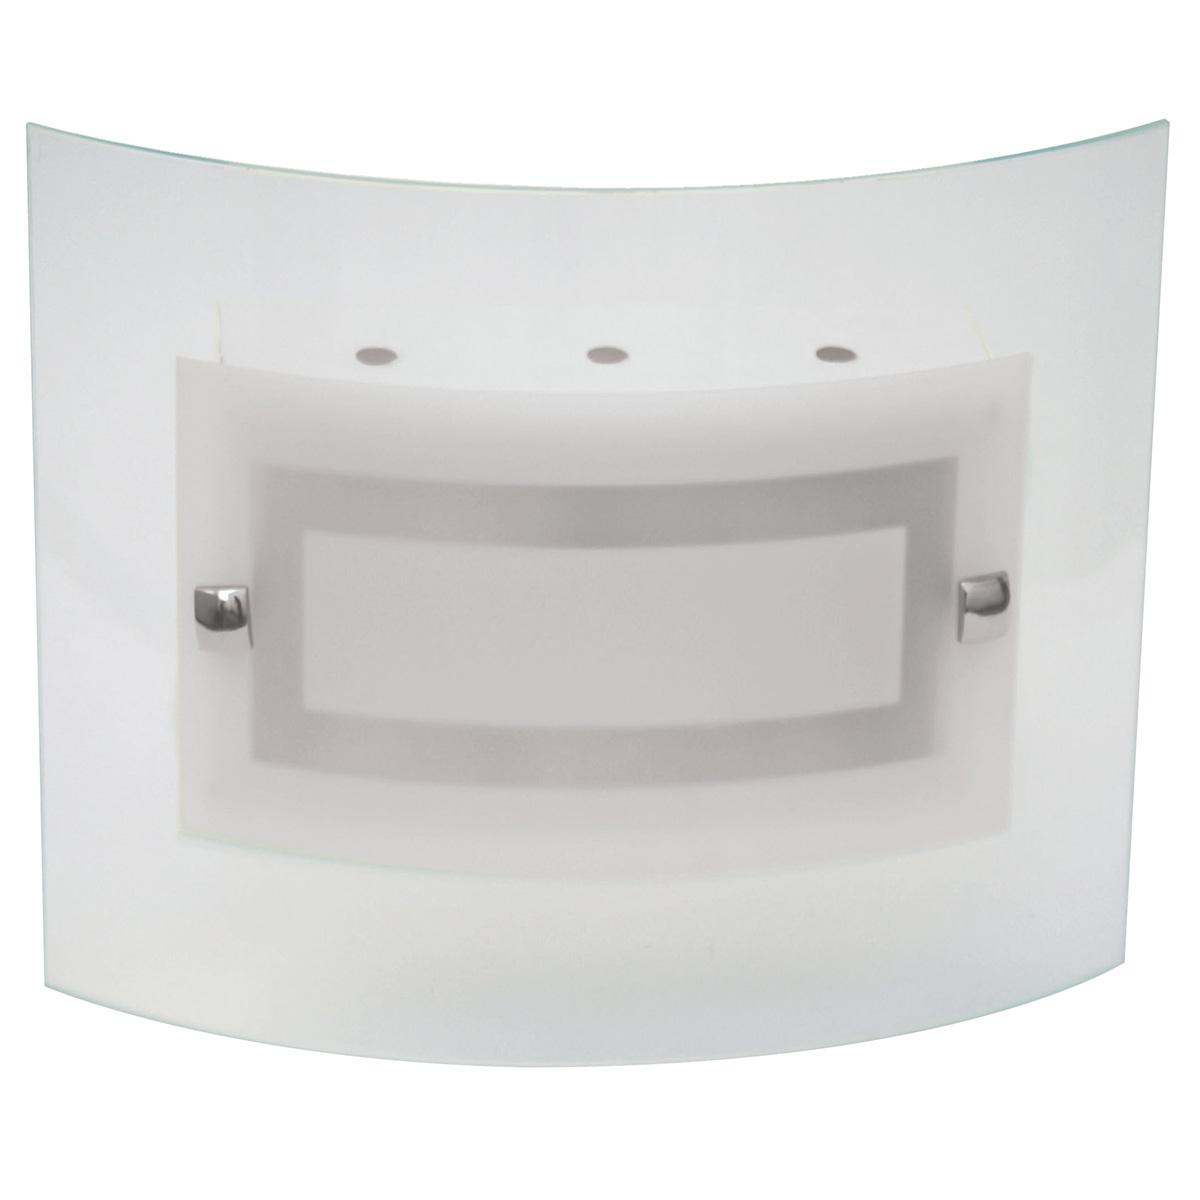 Plafon Artico 50x50cm Com Vidro Curvo Fosco E-27 4 Lamp. Max 60w